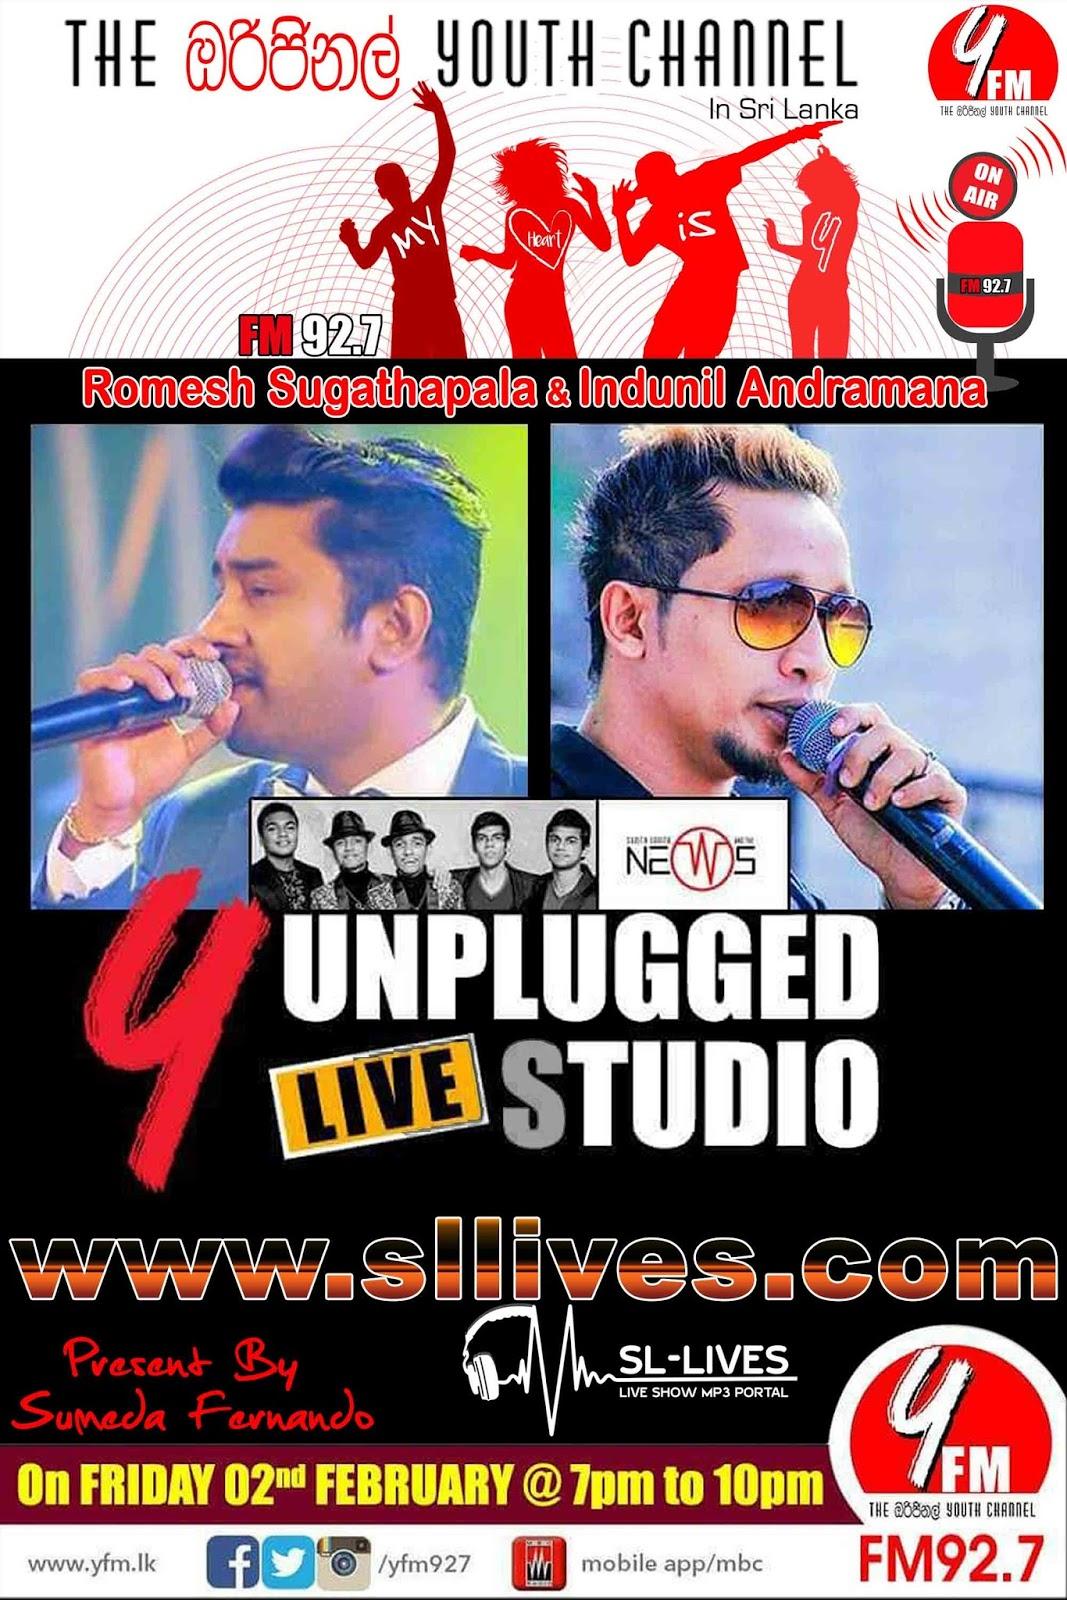 Romesh sugathapala live show